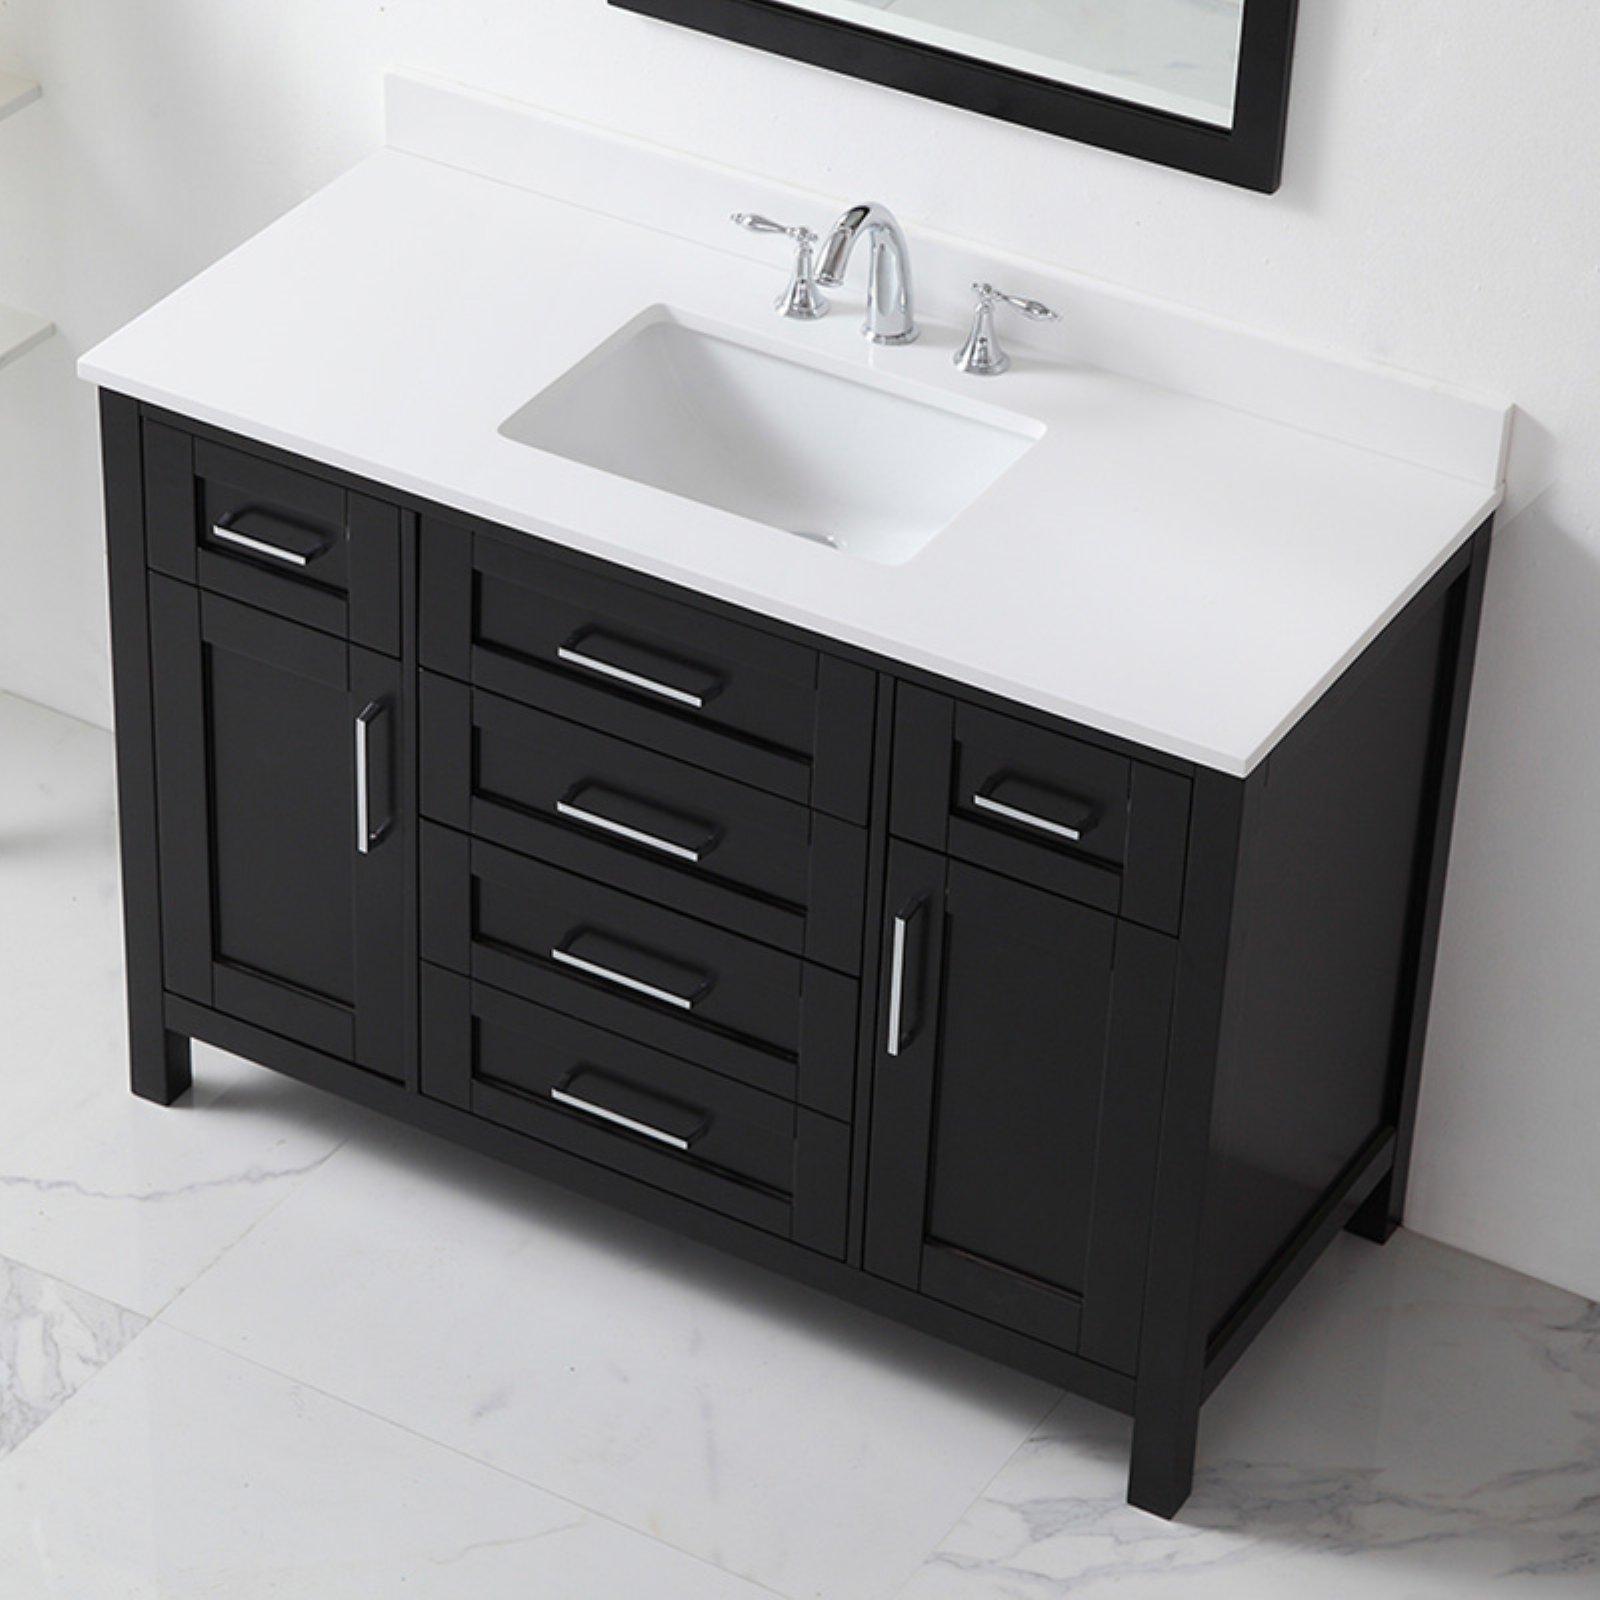 Ove Decors 48 In Single Sink Bathroom Vanity Single Sink Bathroom Vanity Vanity Marble Vanity Tops